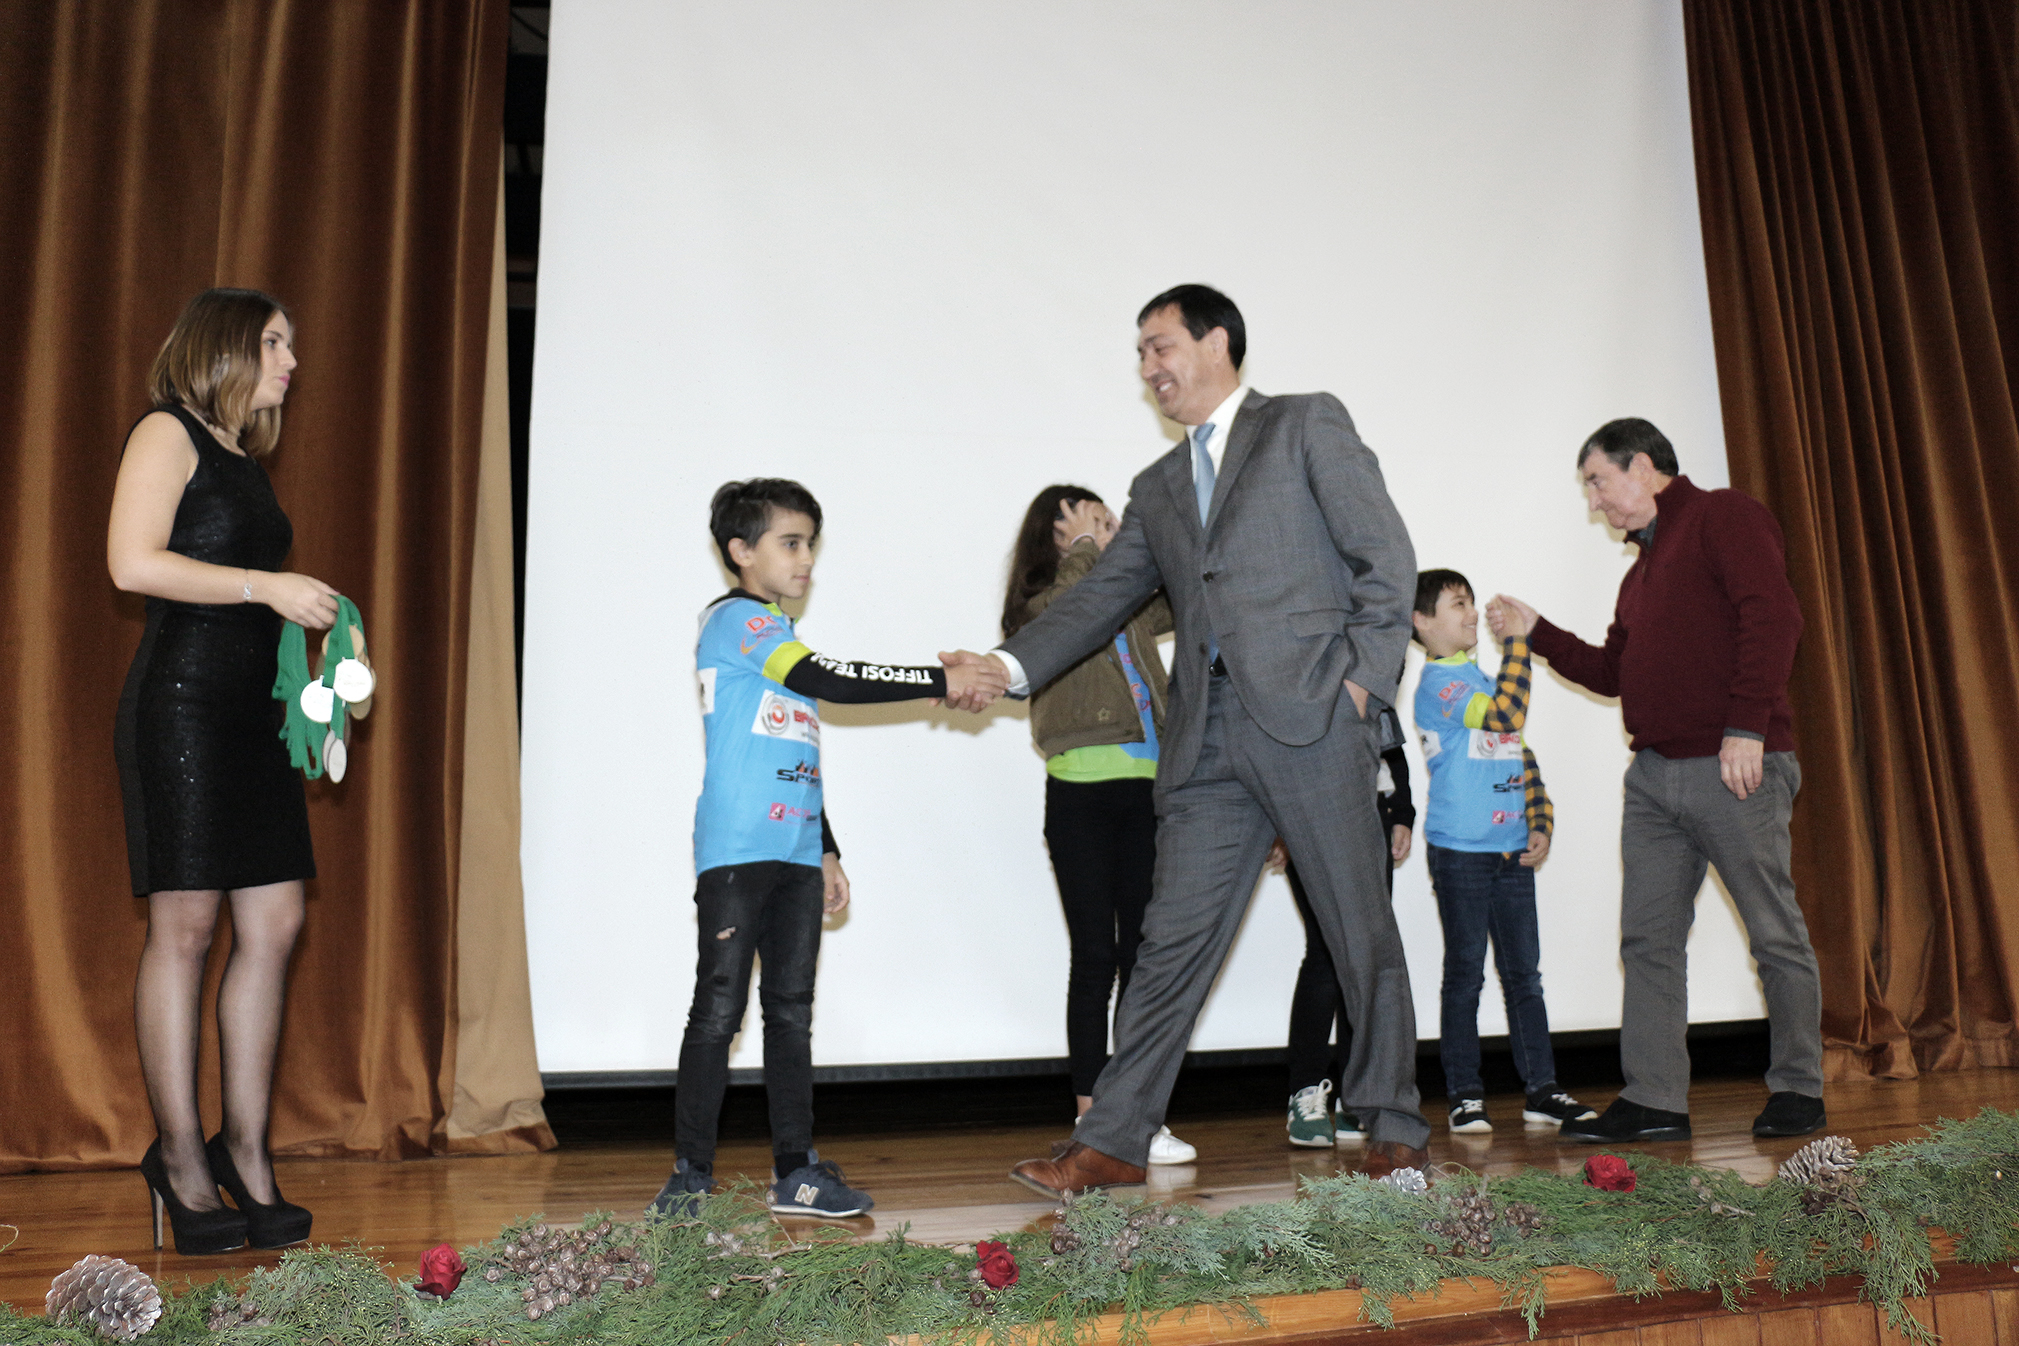 VI Gala de Encerramento ACBL Época 2018